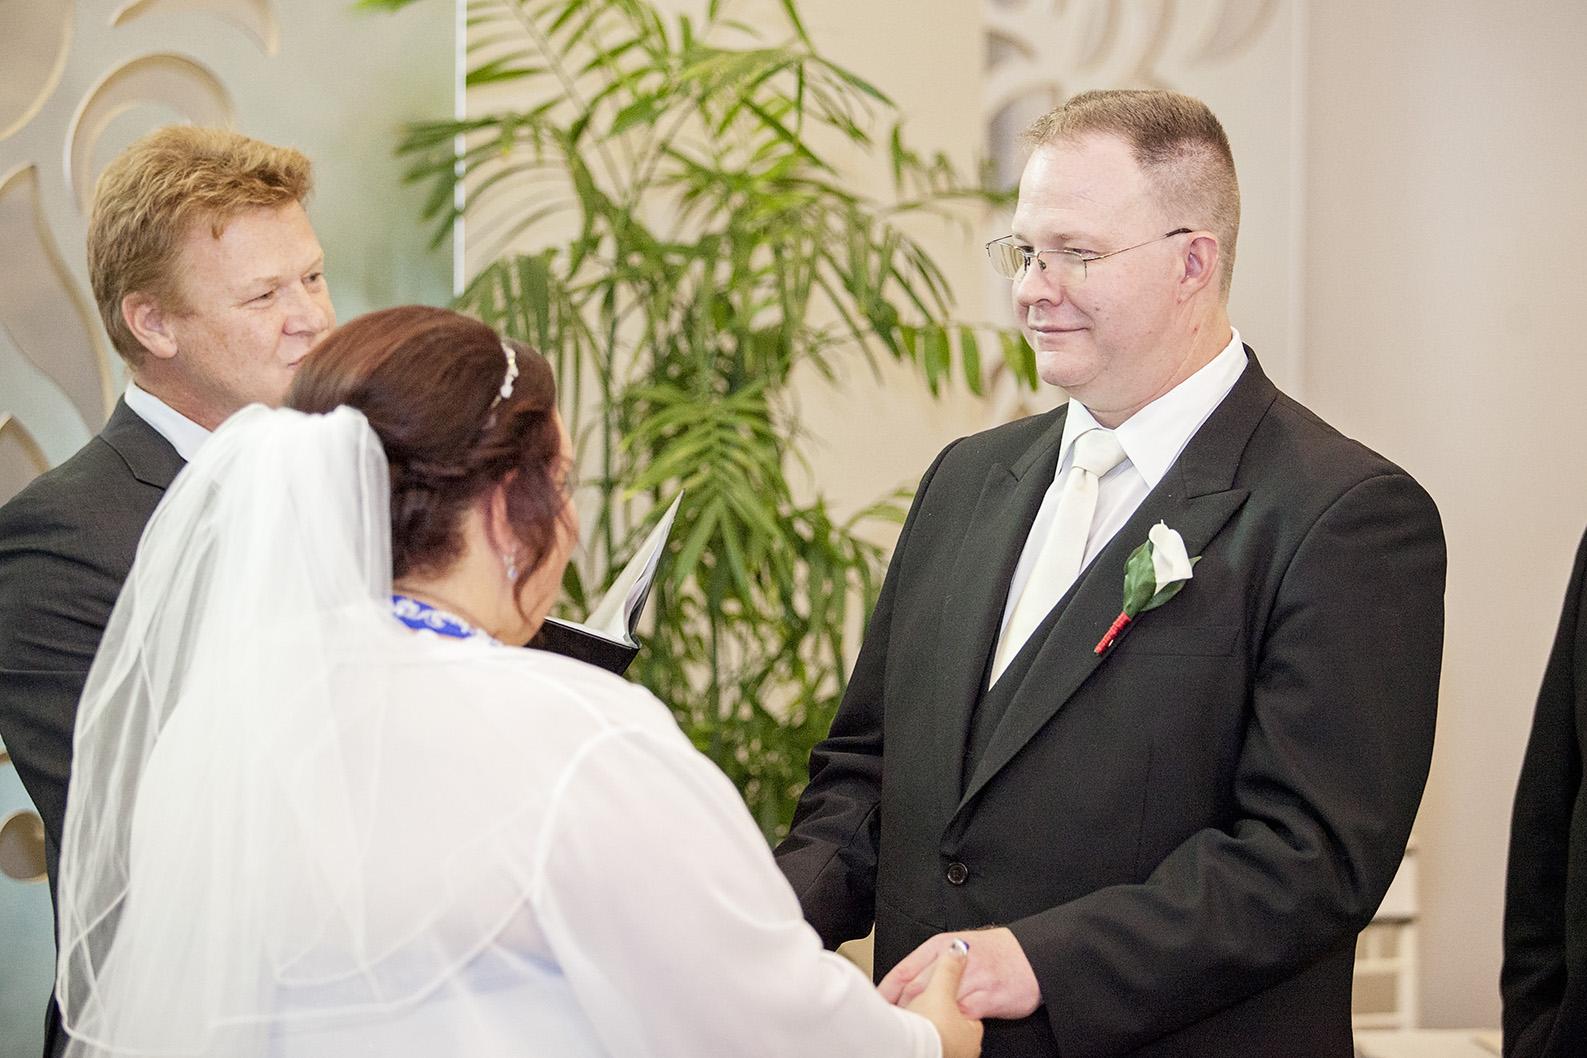 Sferas Modbury wedding 11.jpg